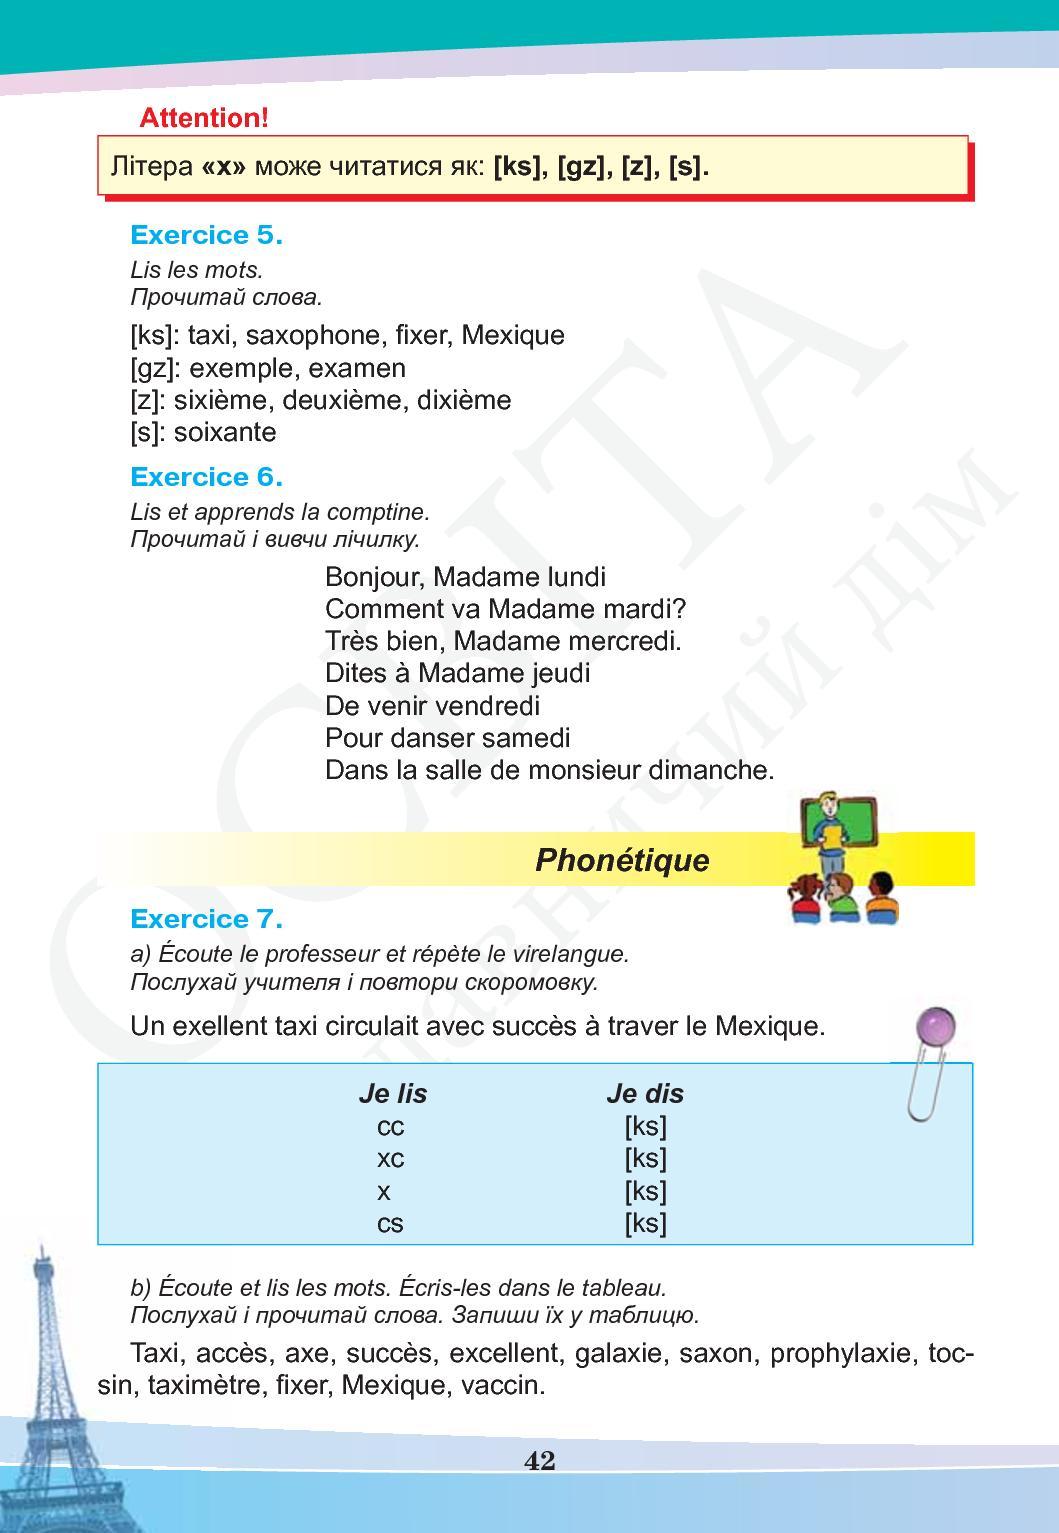 Французька Мова - Calameo Downloader destiné Comptine Bonjour Madame Lundi